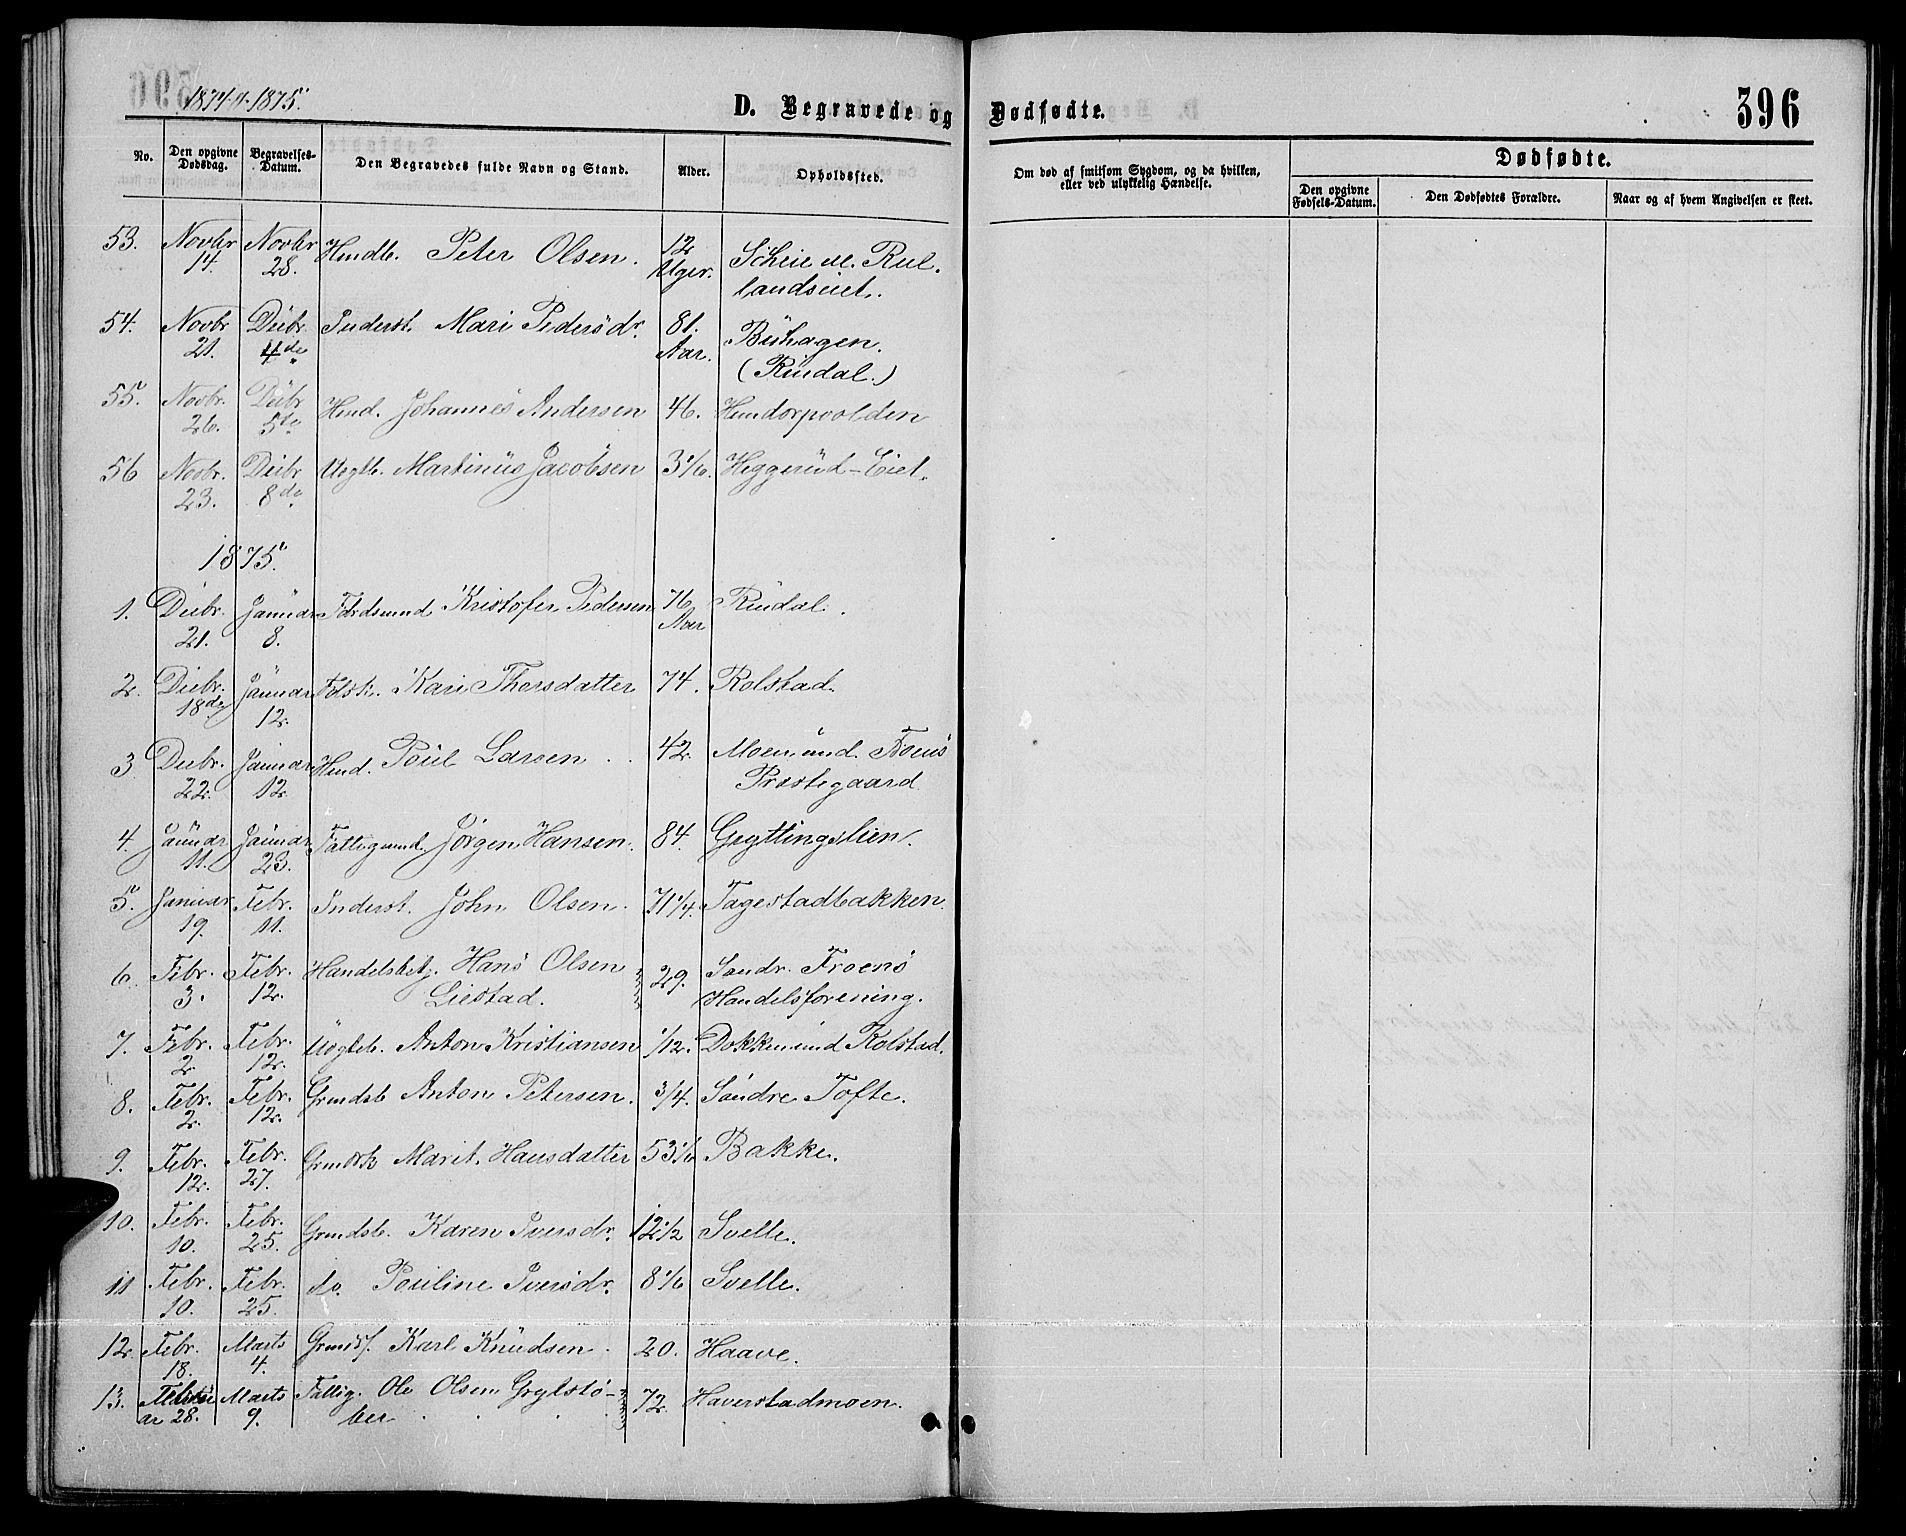 SAH, Sør-Fron prestekontor, H/Ha/Hab/L0002: Klokkerbok nr. 2, 1864-1883, s. 396